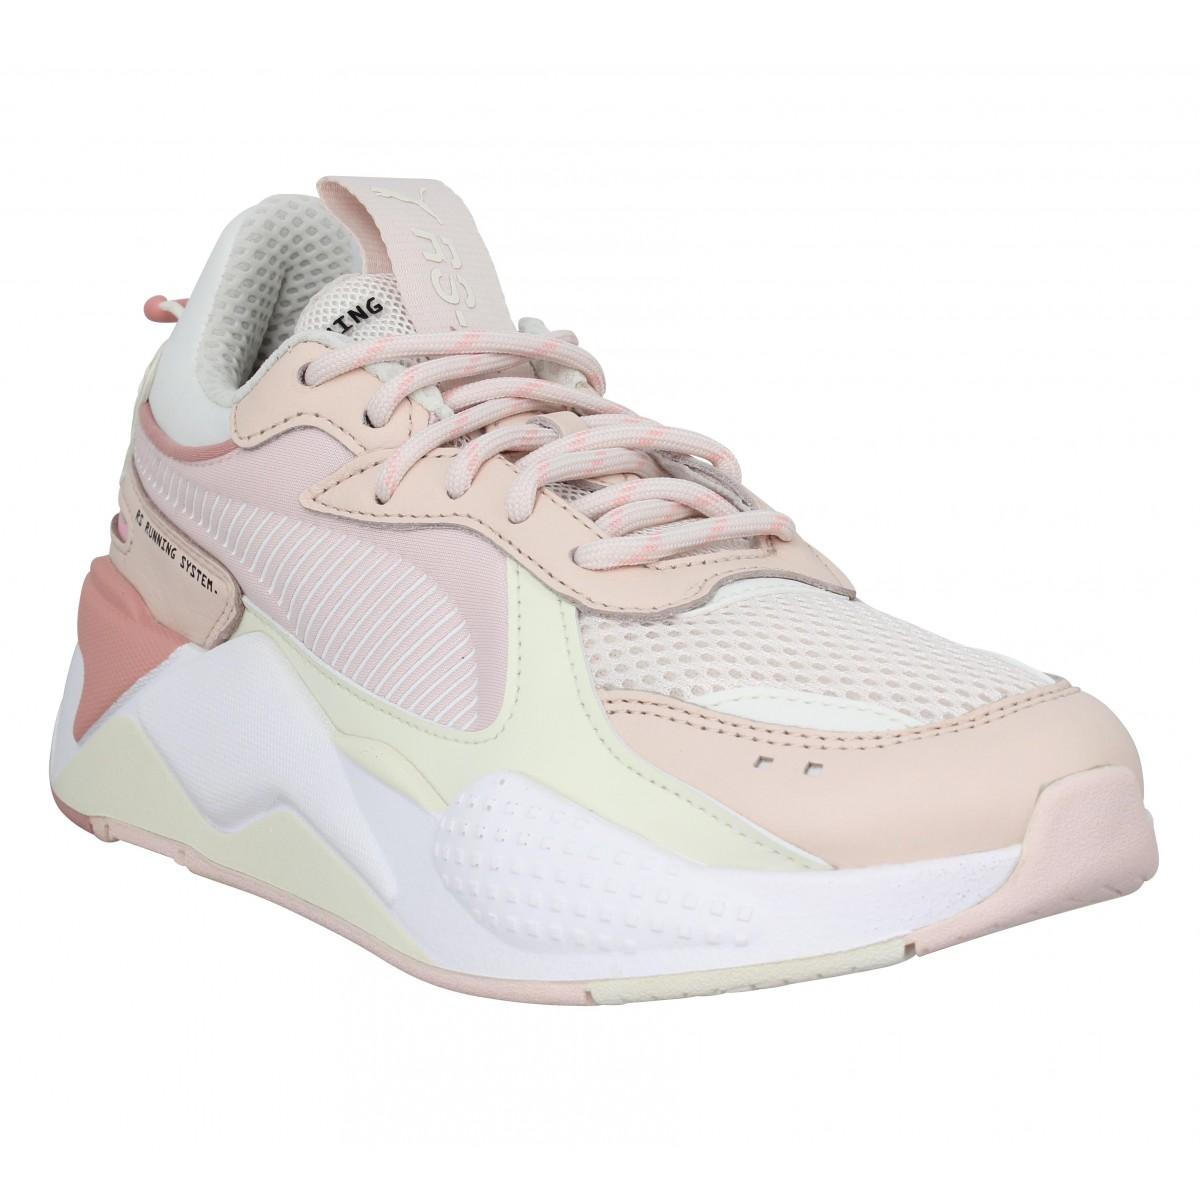 puma rs x femme blanche rose